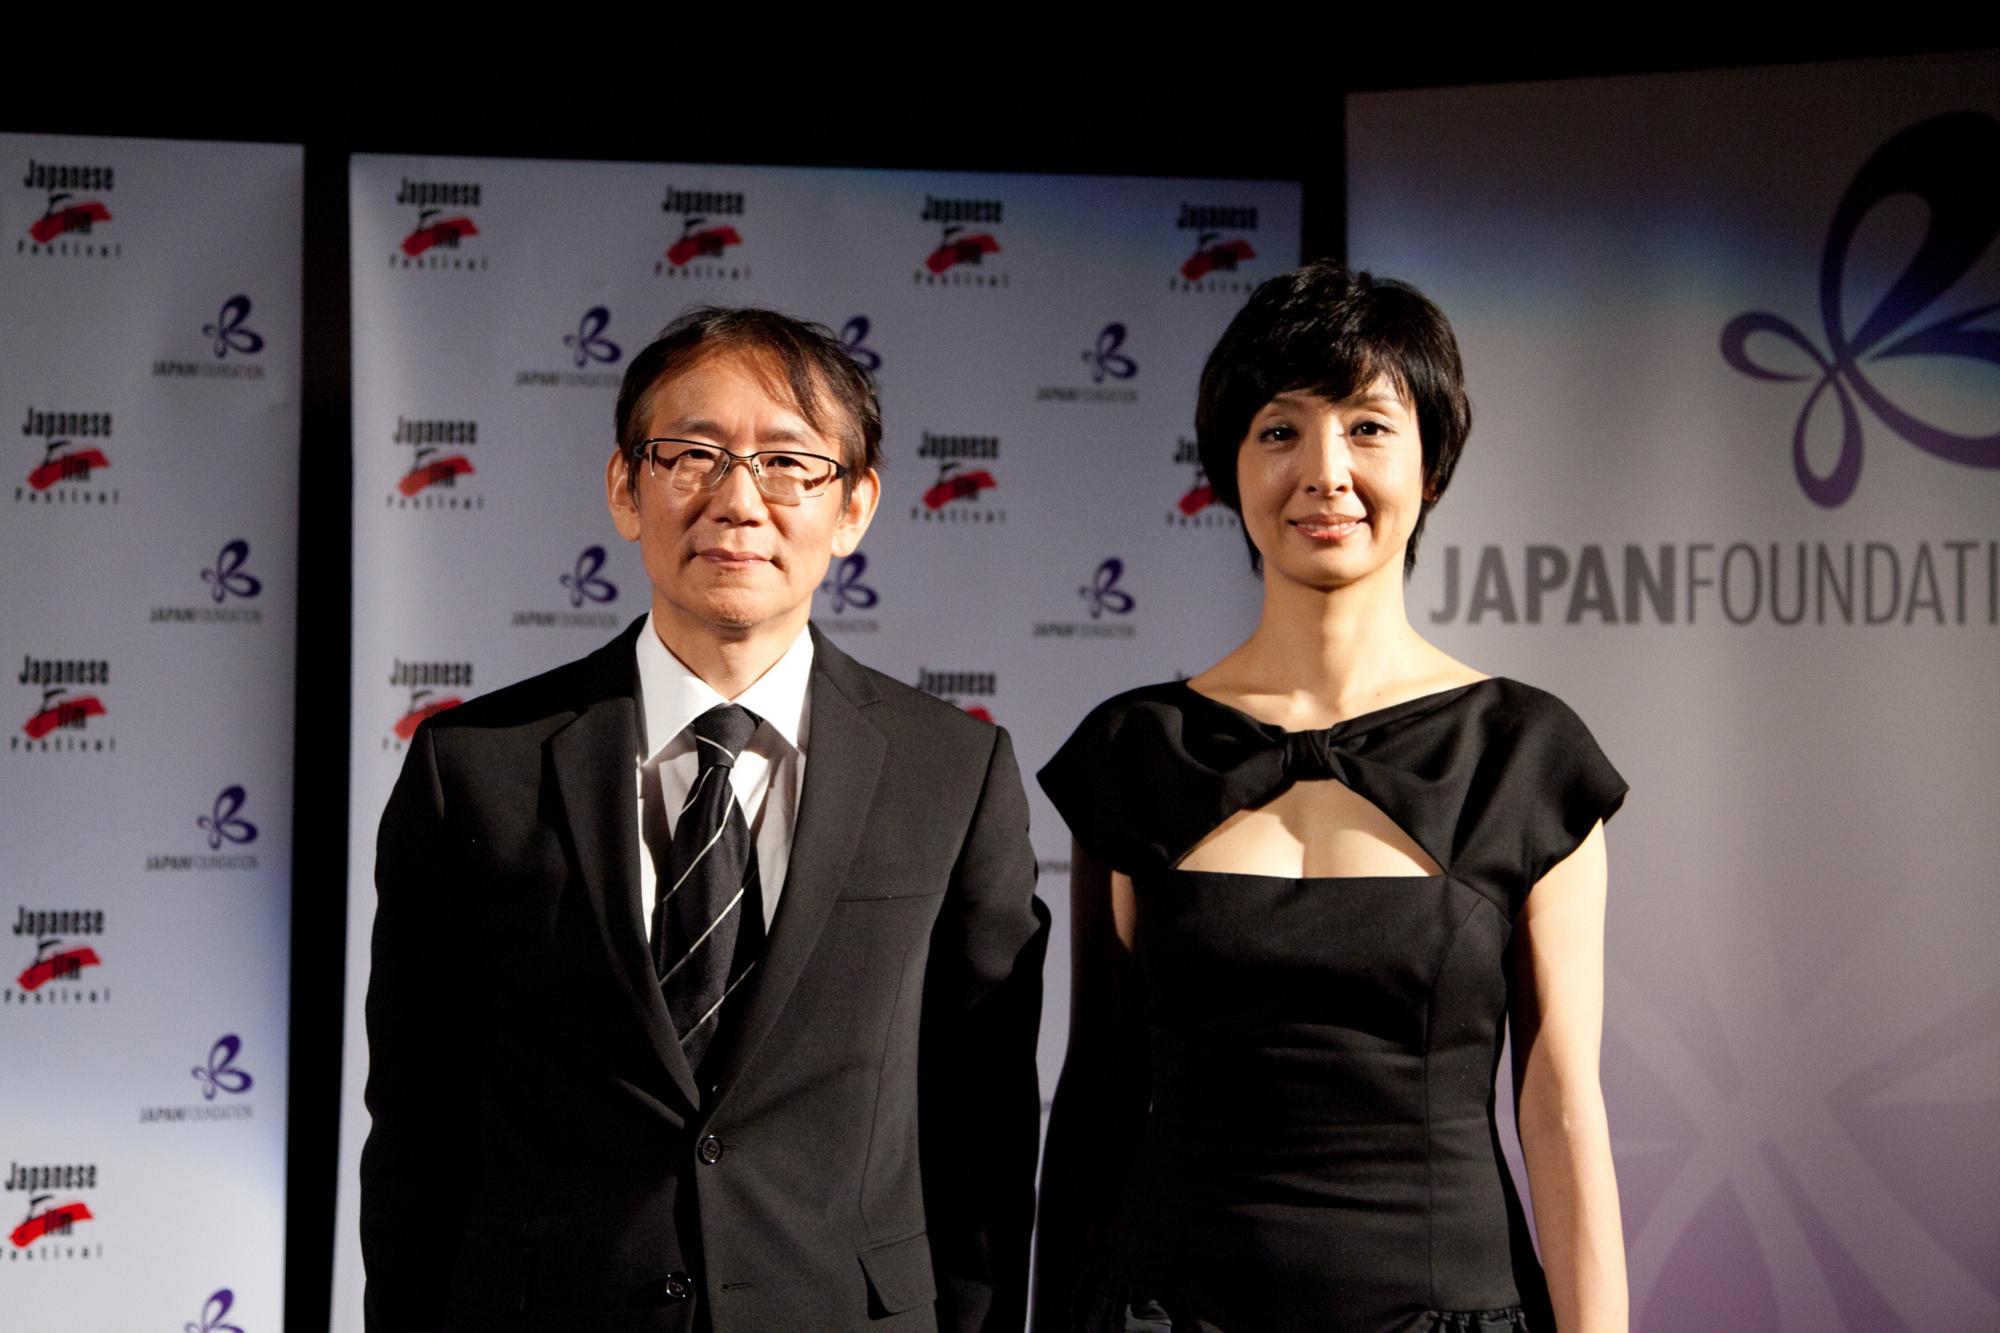 f:id:japanfoundation:20121207160803j:image:w360